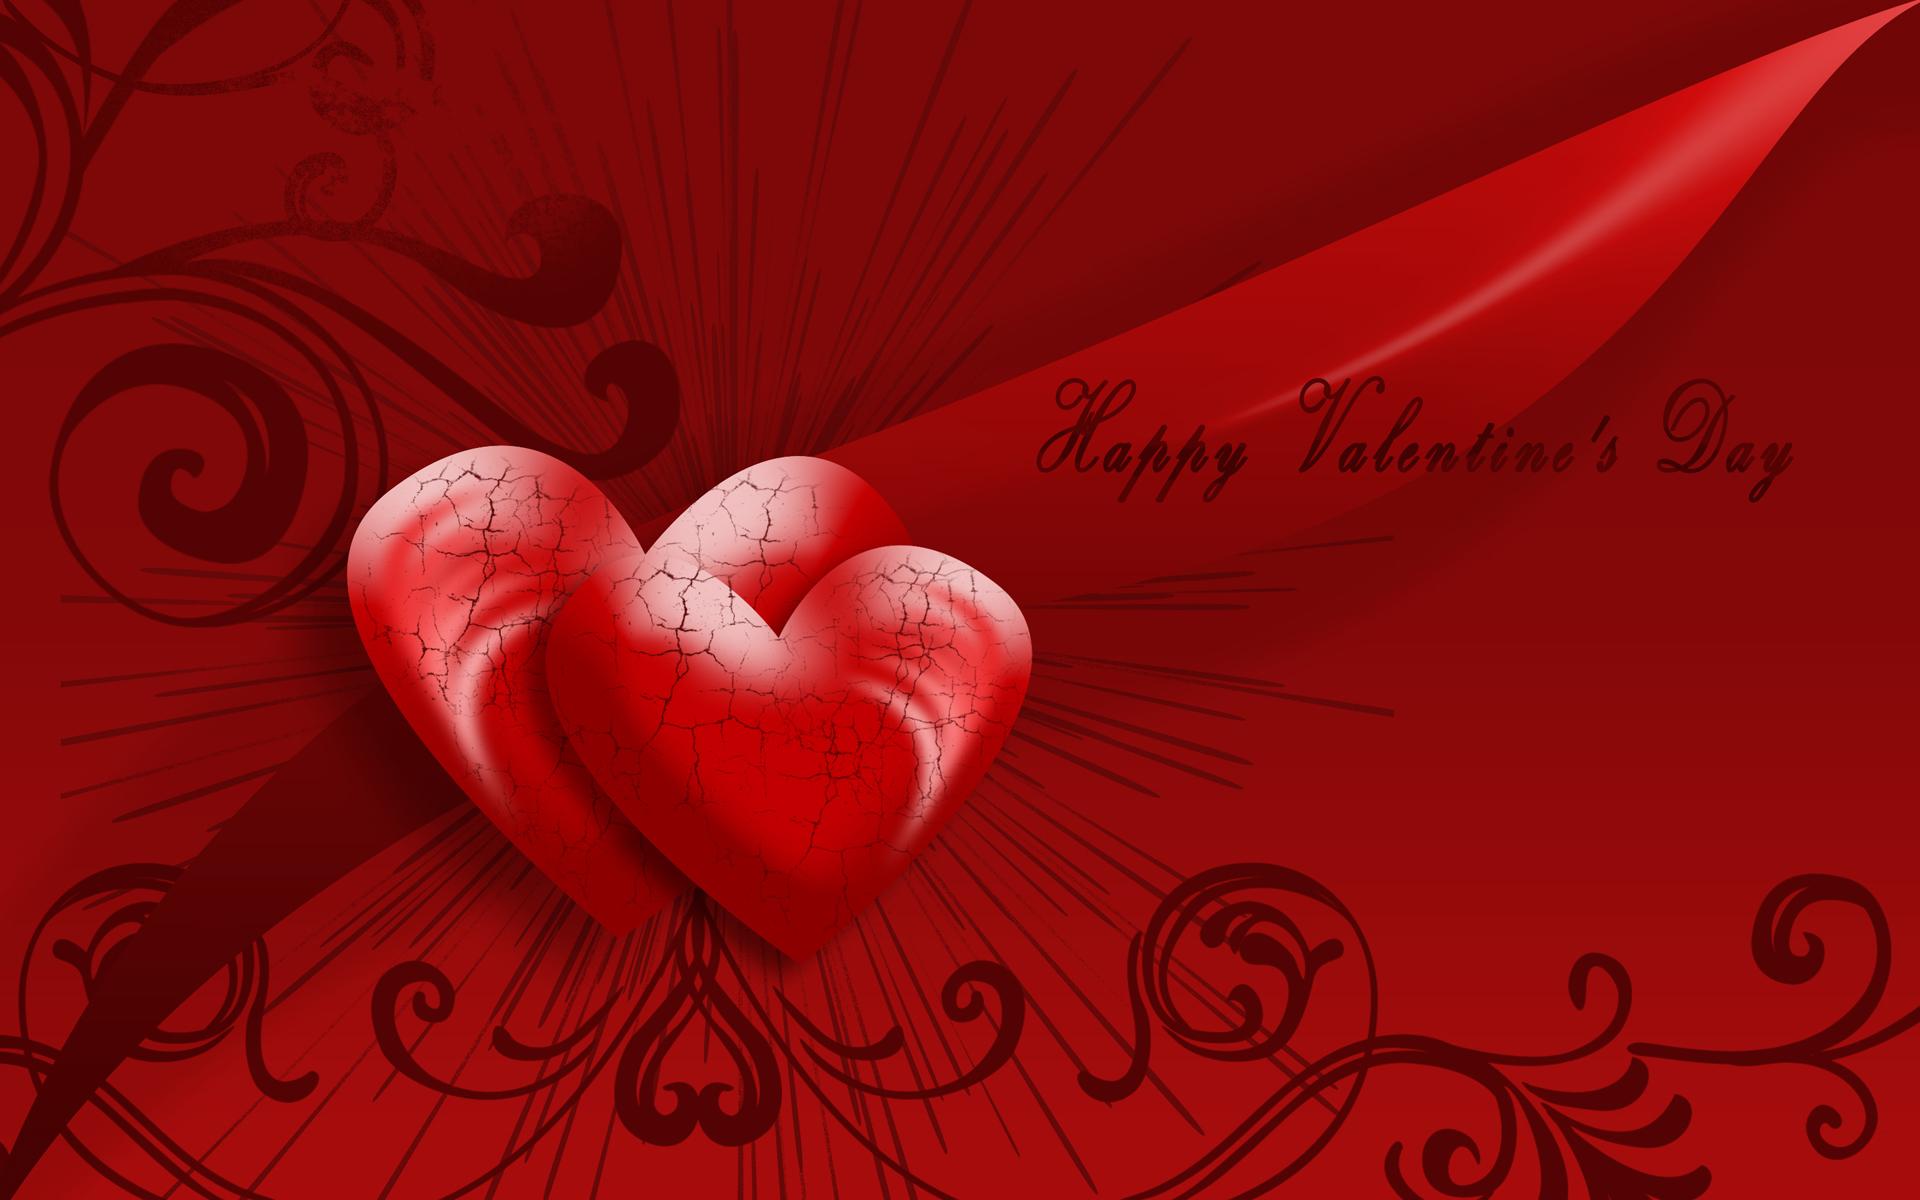 Happy Valentines Day 1920x1200 wallpaper 851 kb 1920x1200